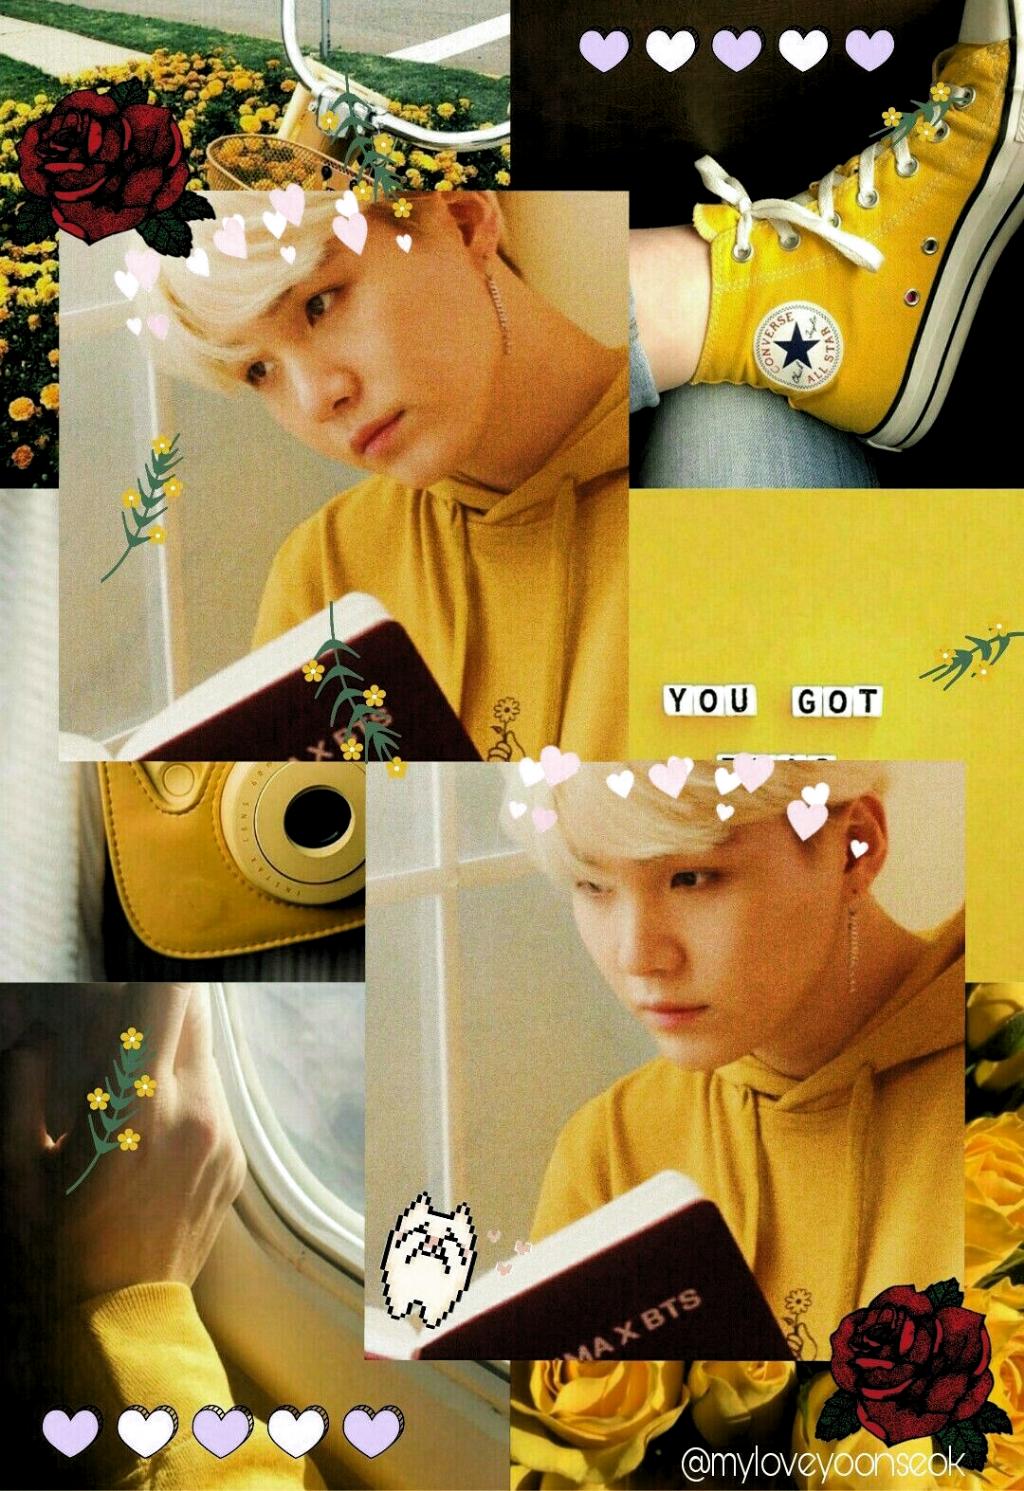 Untitled In 2020 Bts Wallpaper Iphone Wallpaper Yellow Bts